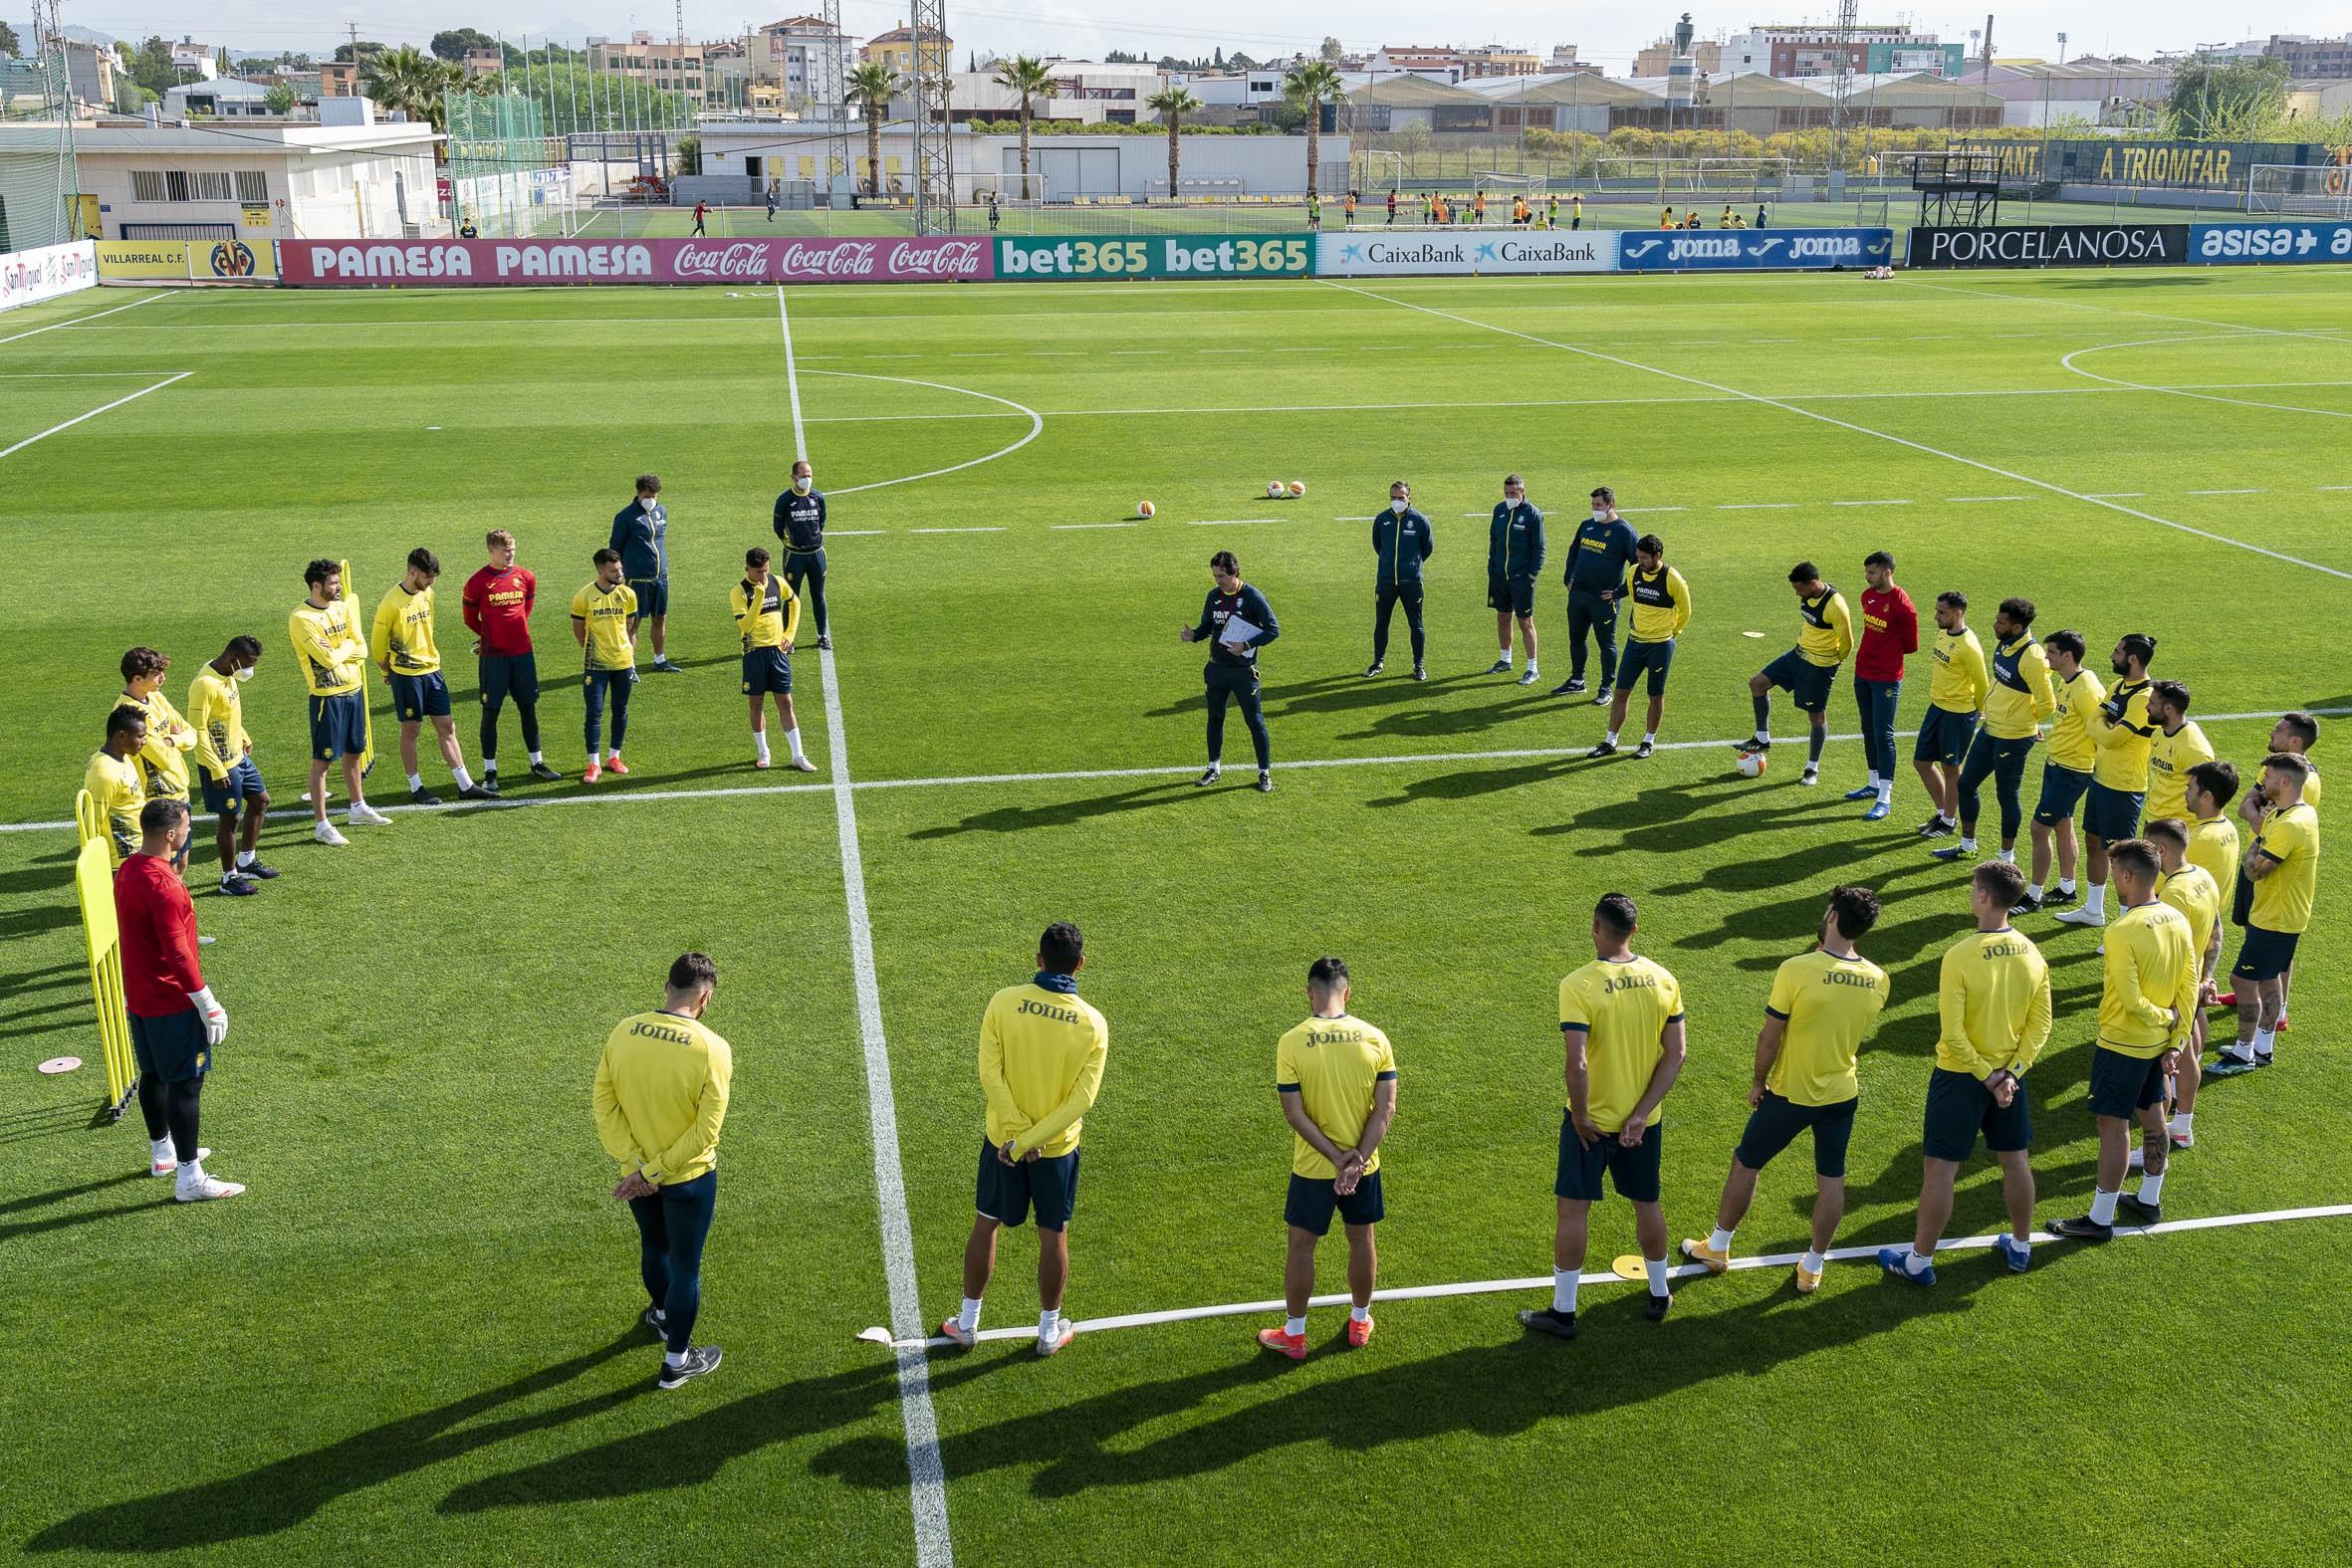 Emery melihat setiap hari di Villarreal sebagai kesempatan untuk belajar, mengasah keterampilan dan pengetahuan kepelatihannya.  Foto: Villarreal CF